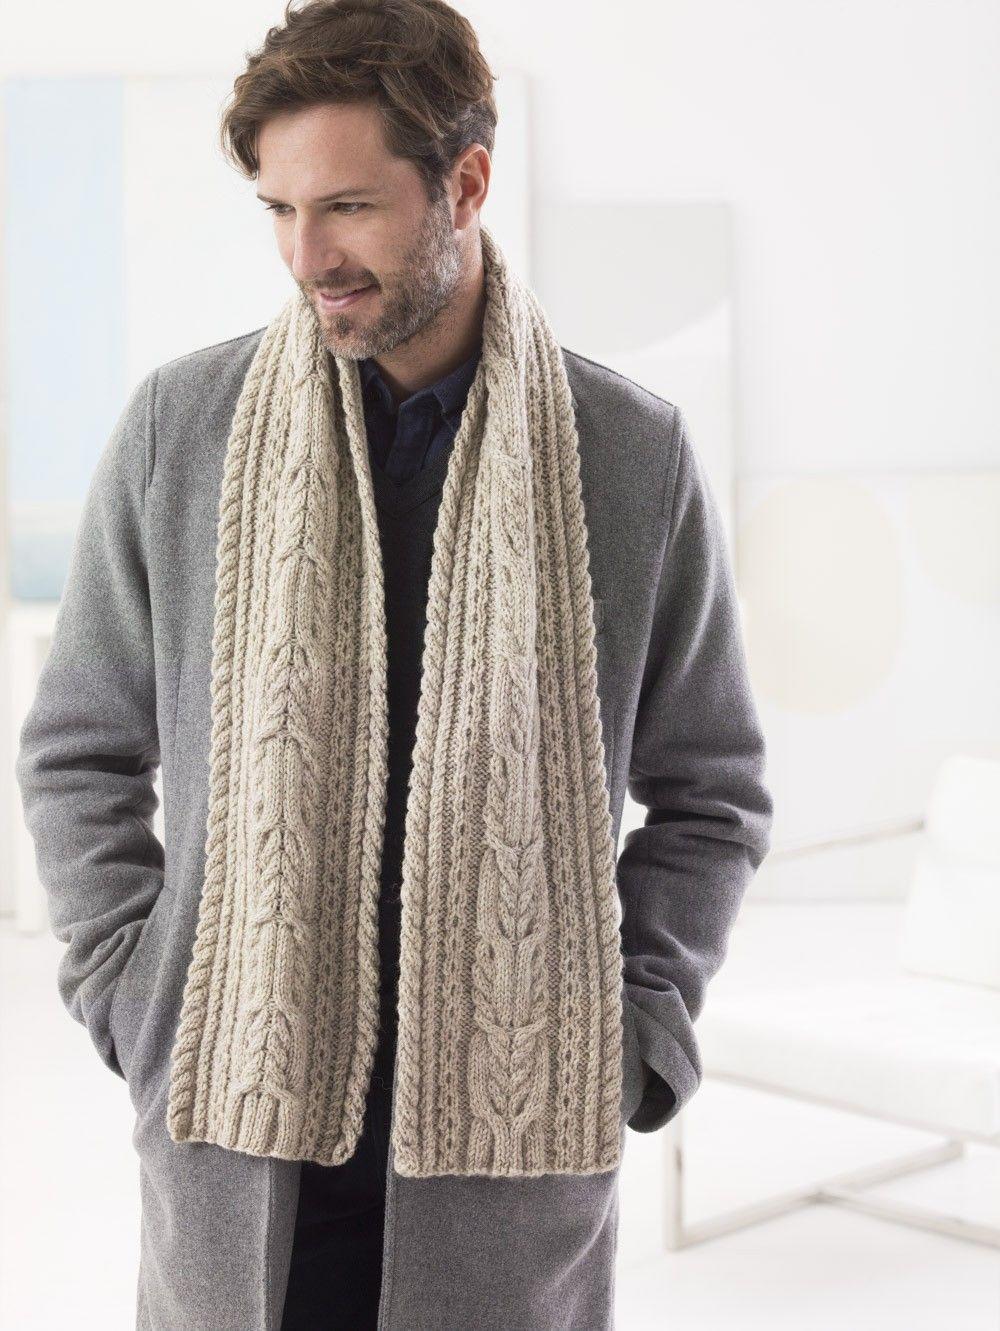 Chestnut Street Scarf (Knit) Pattern at Lion Brand Yarns ...